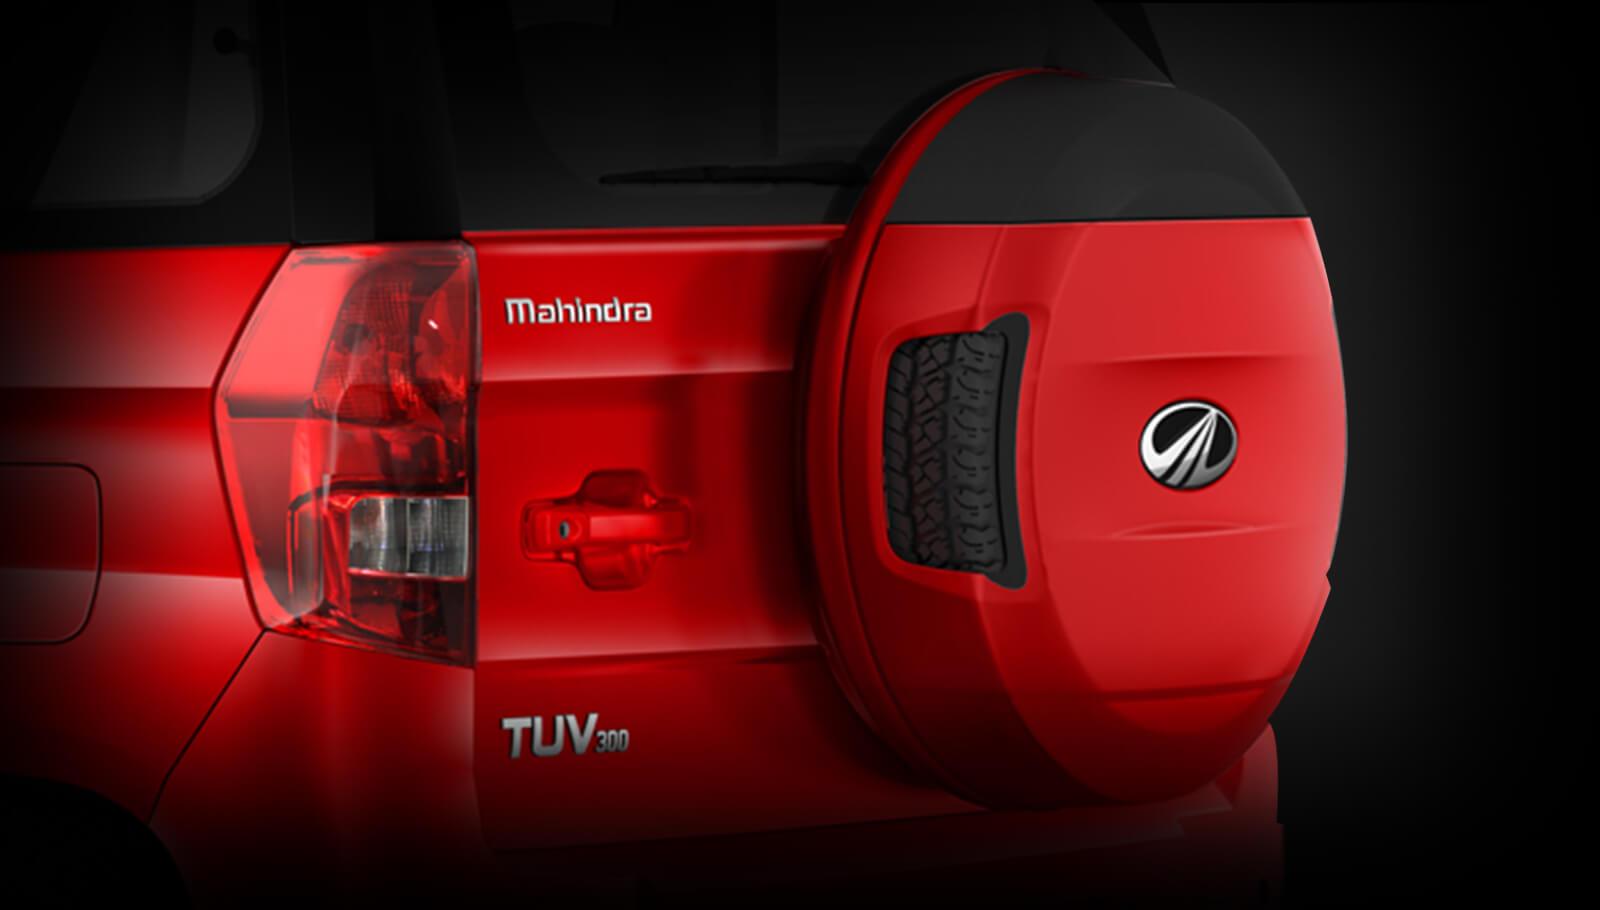 Mahindra TUV300 tailgate website image